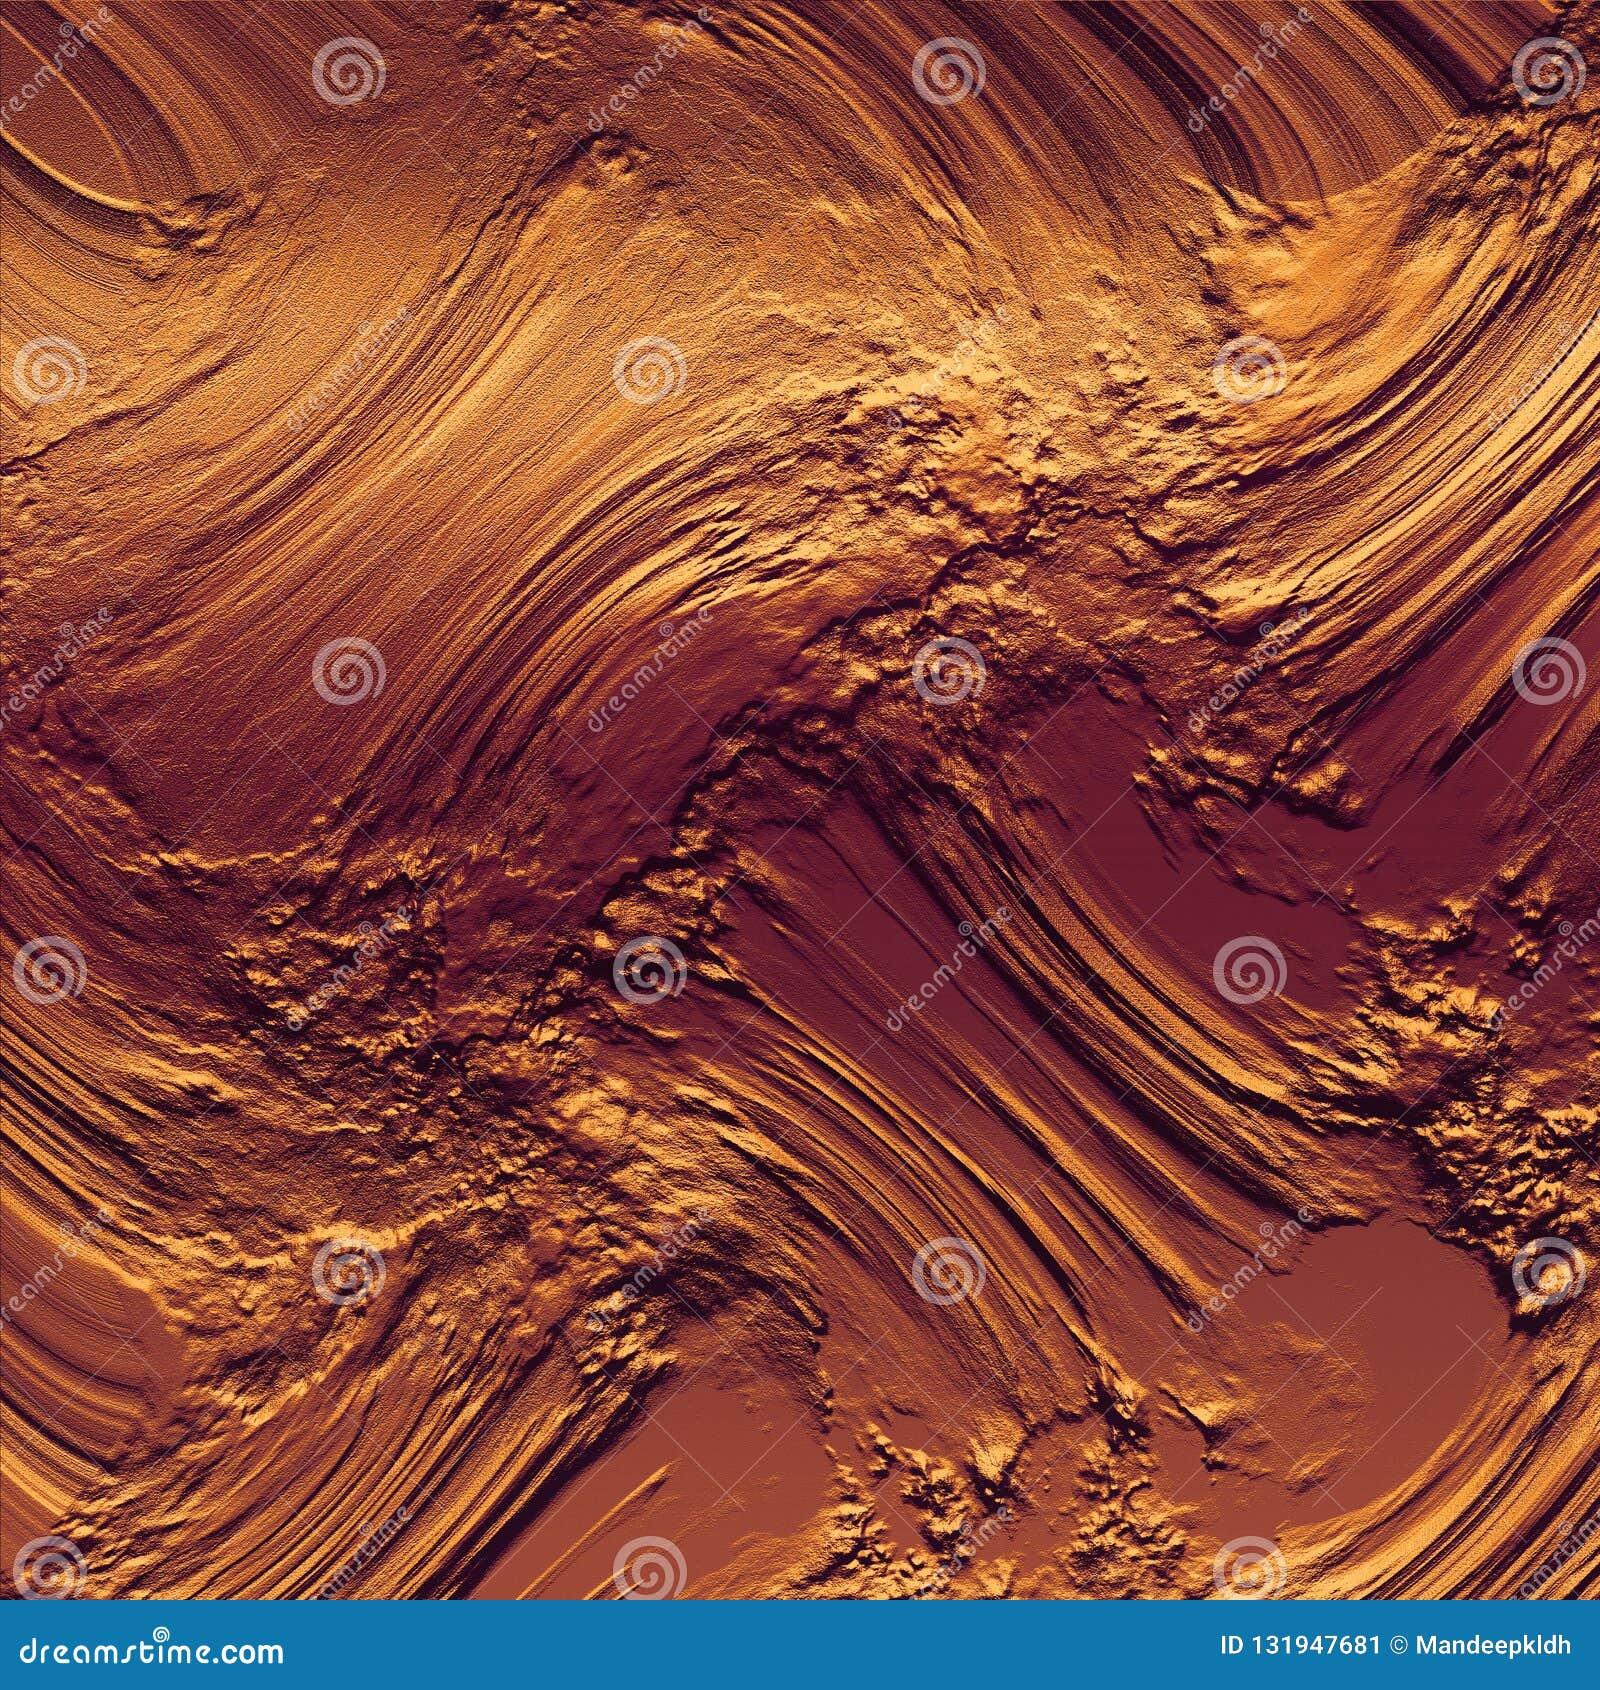 Fundos textured da lama de cobre textura 3D enlameada no fundo brilhante